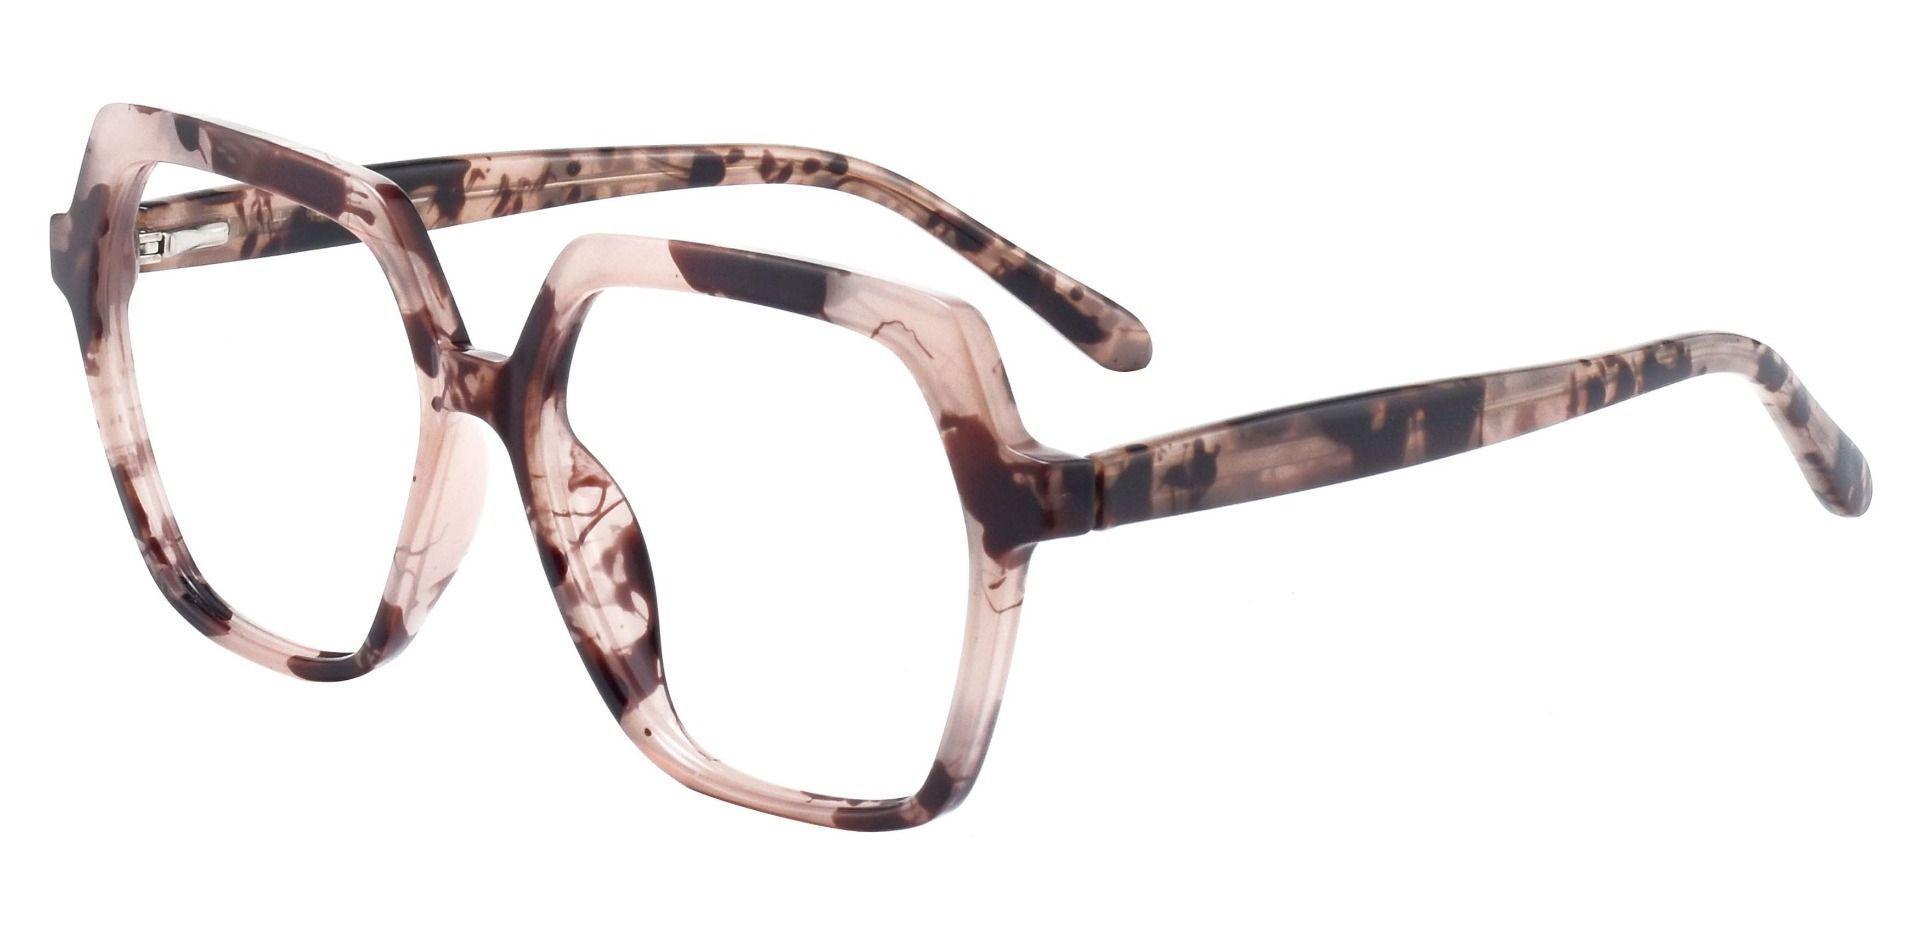 Regent Geometric Prescription Glasses - Tortoise